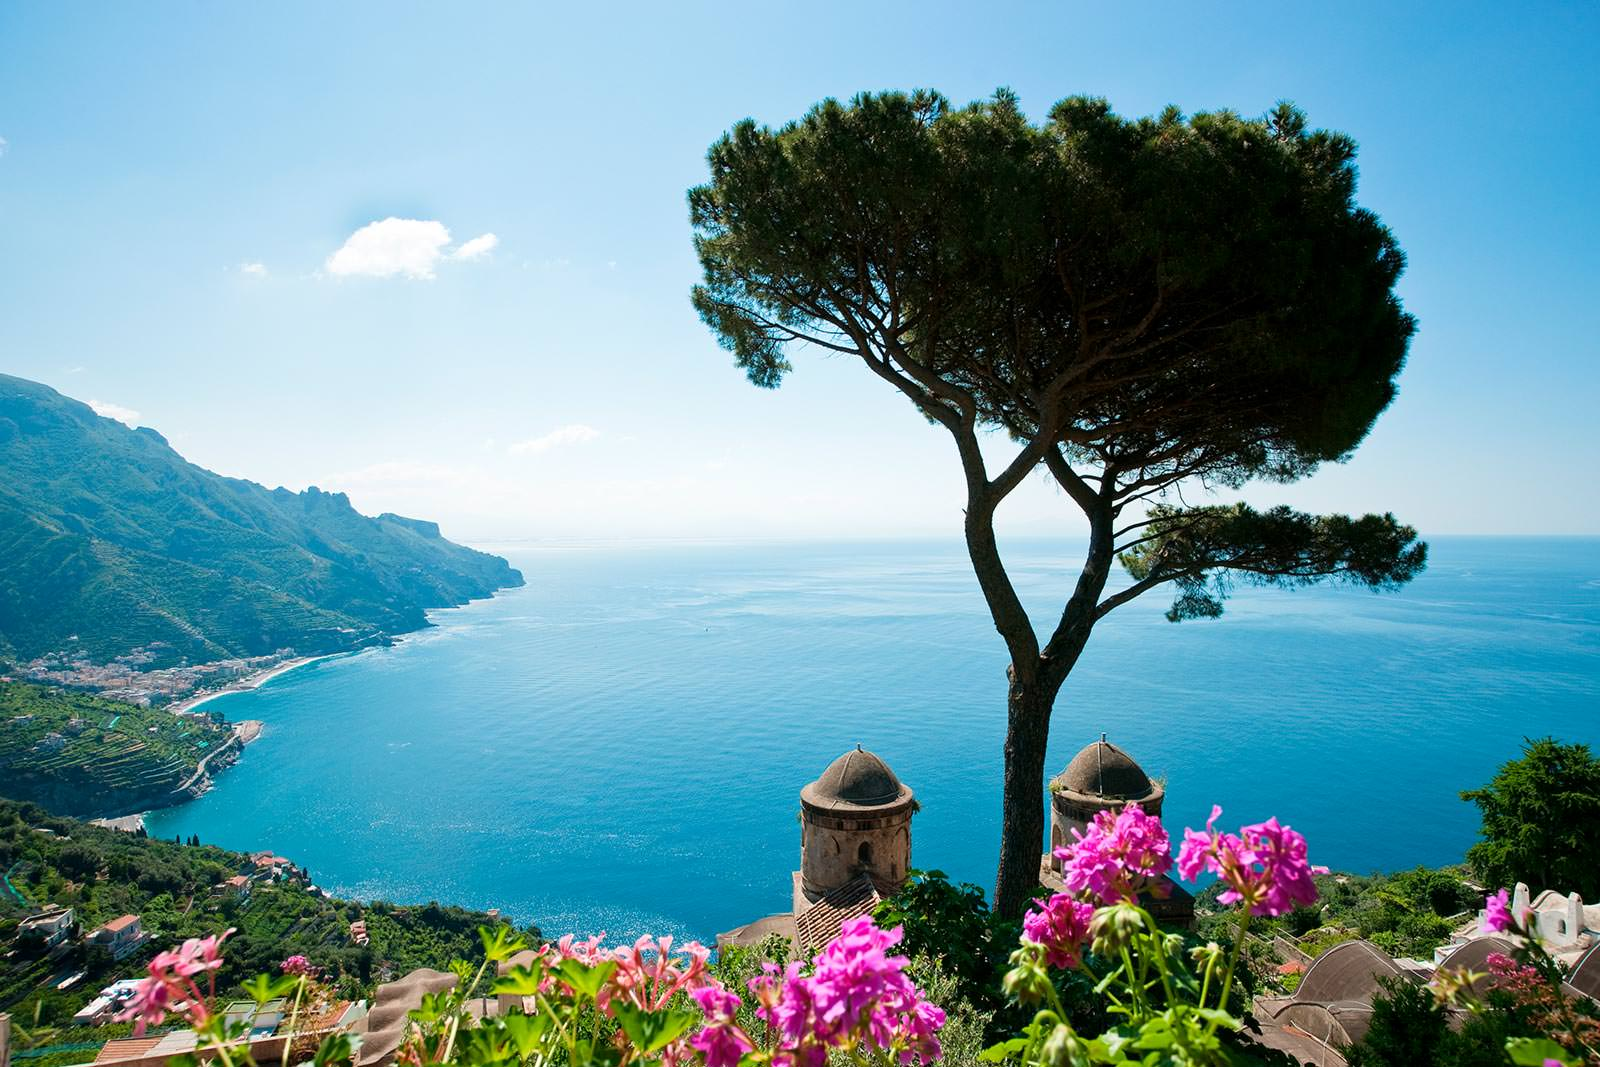 картинки весенняя природа средиземноморье салаты шашлыку